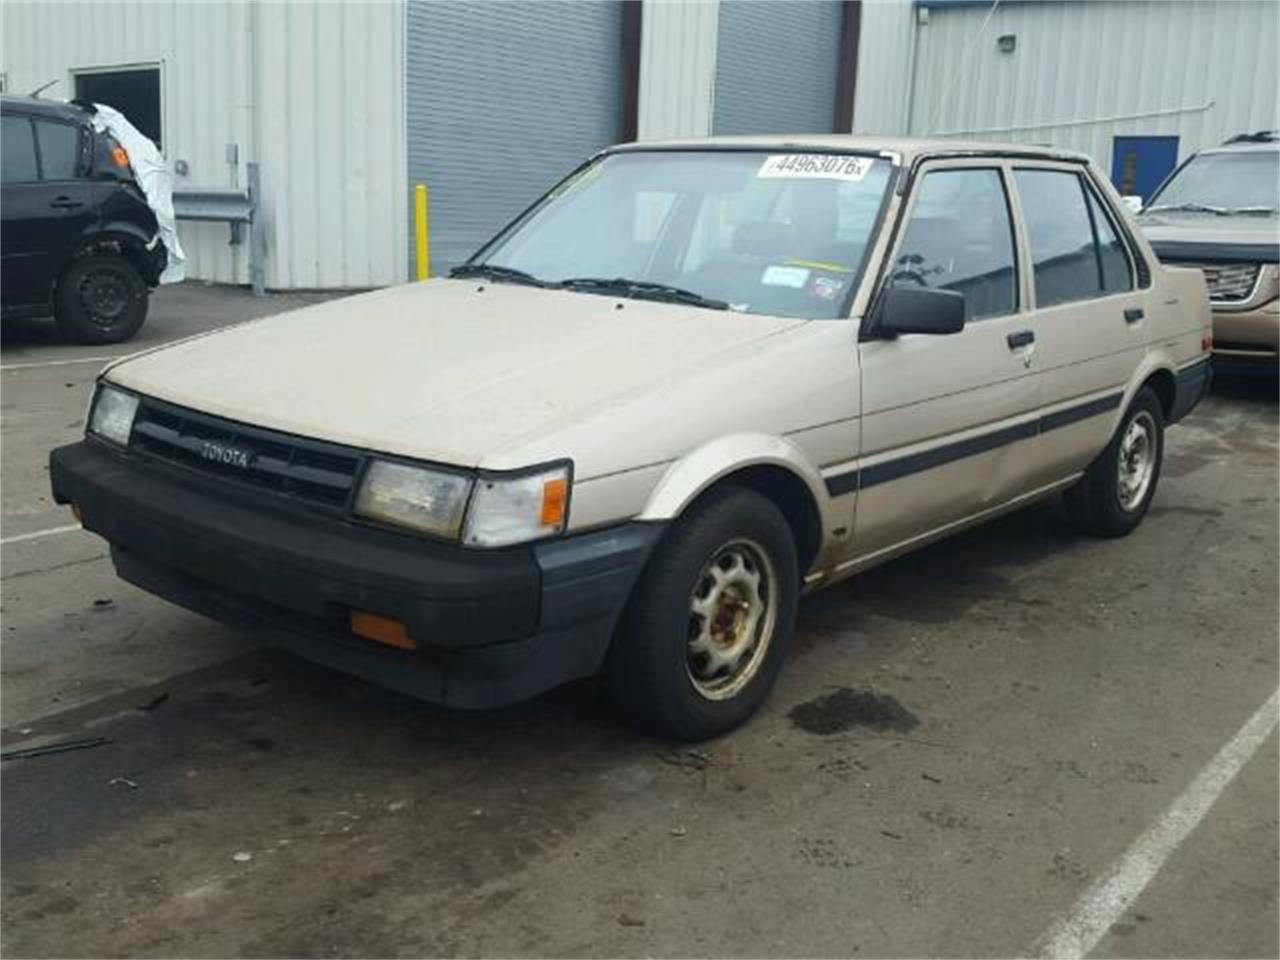 1987 toyota corolla for sale classiccars com cc 948470 1987 toyota corolla for sale